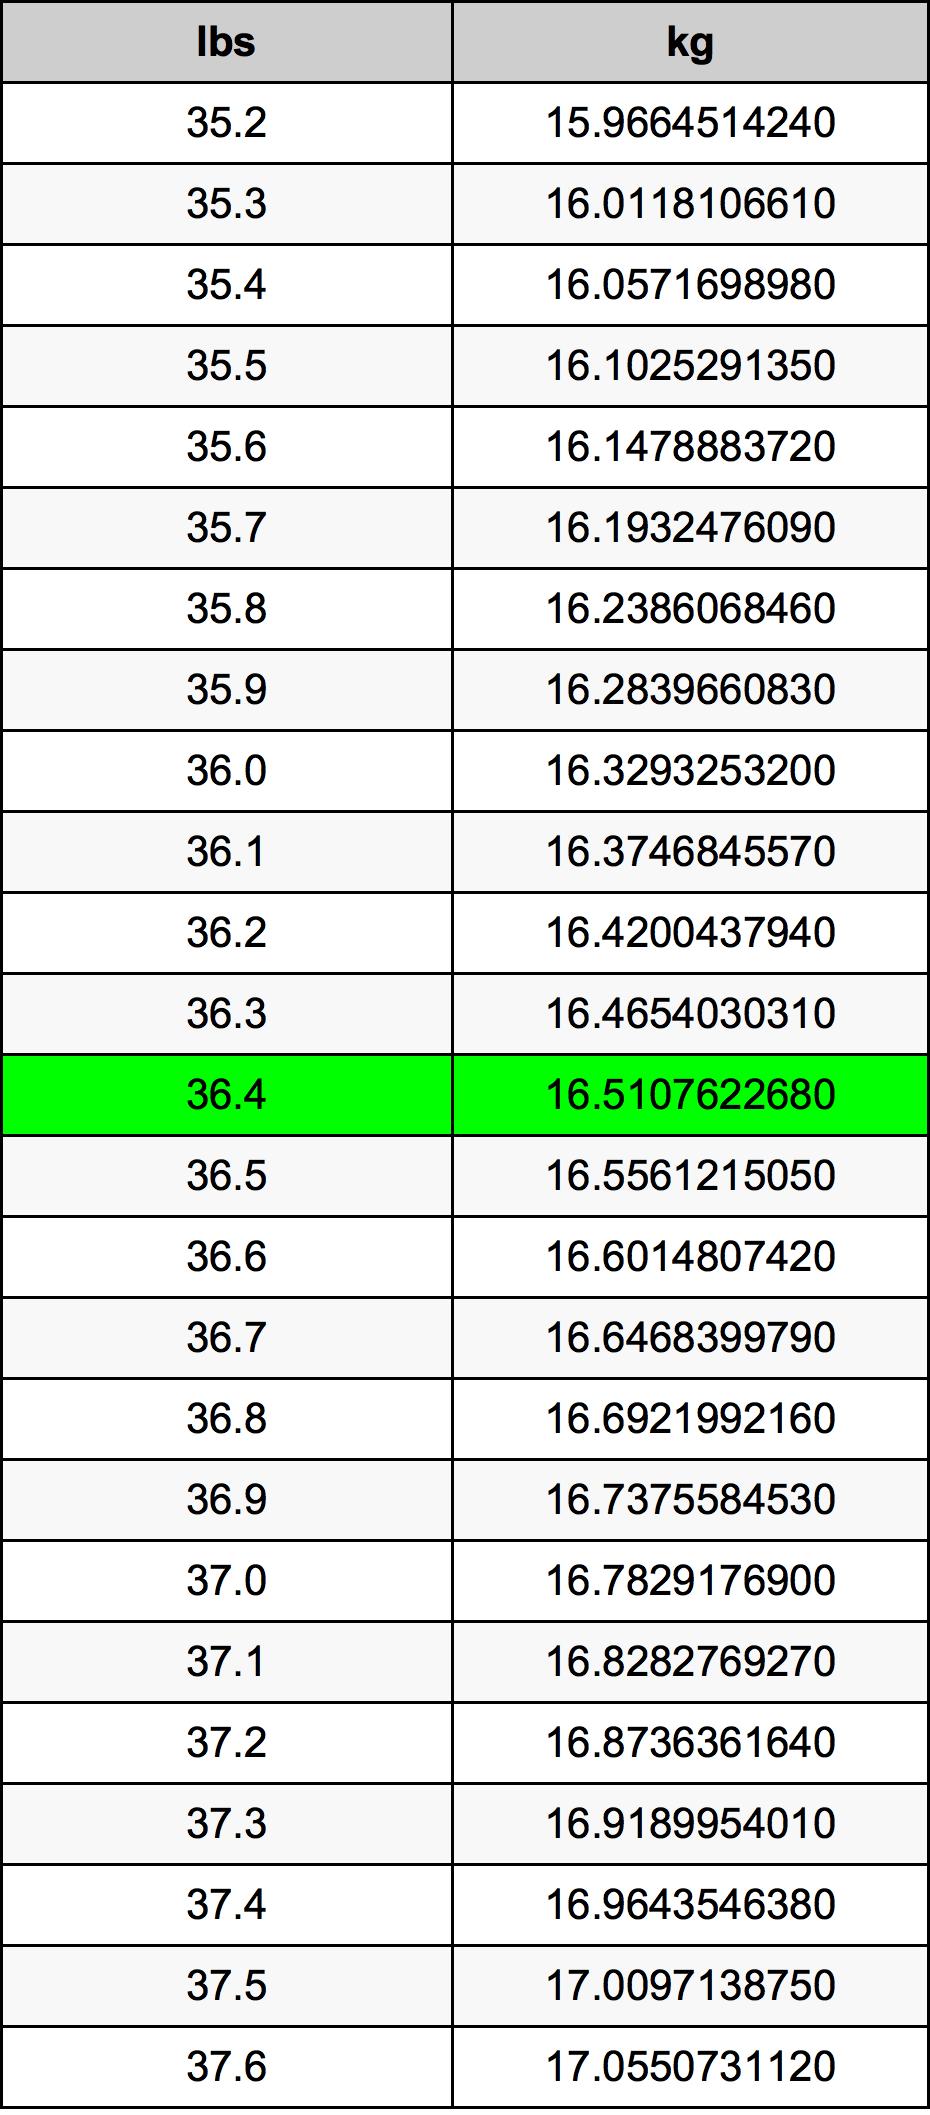 36.4 Pon konversi tabel